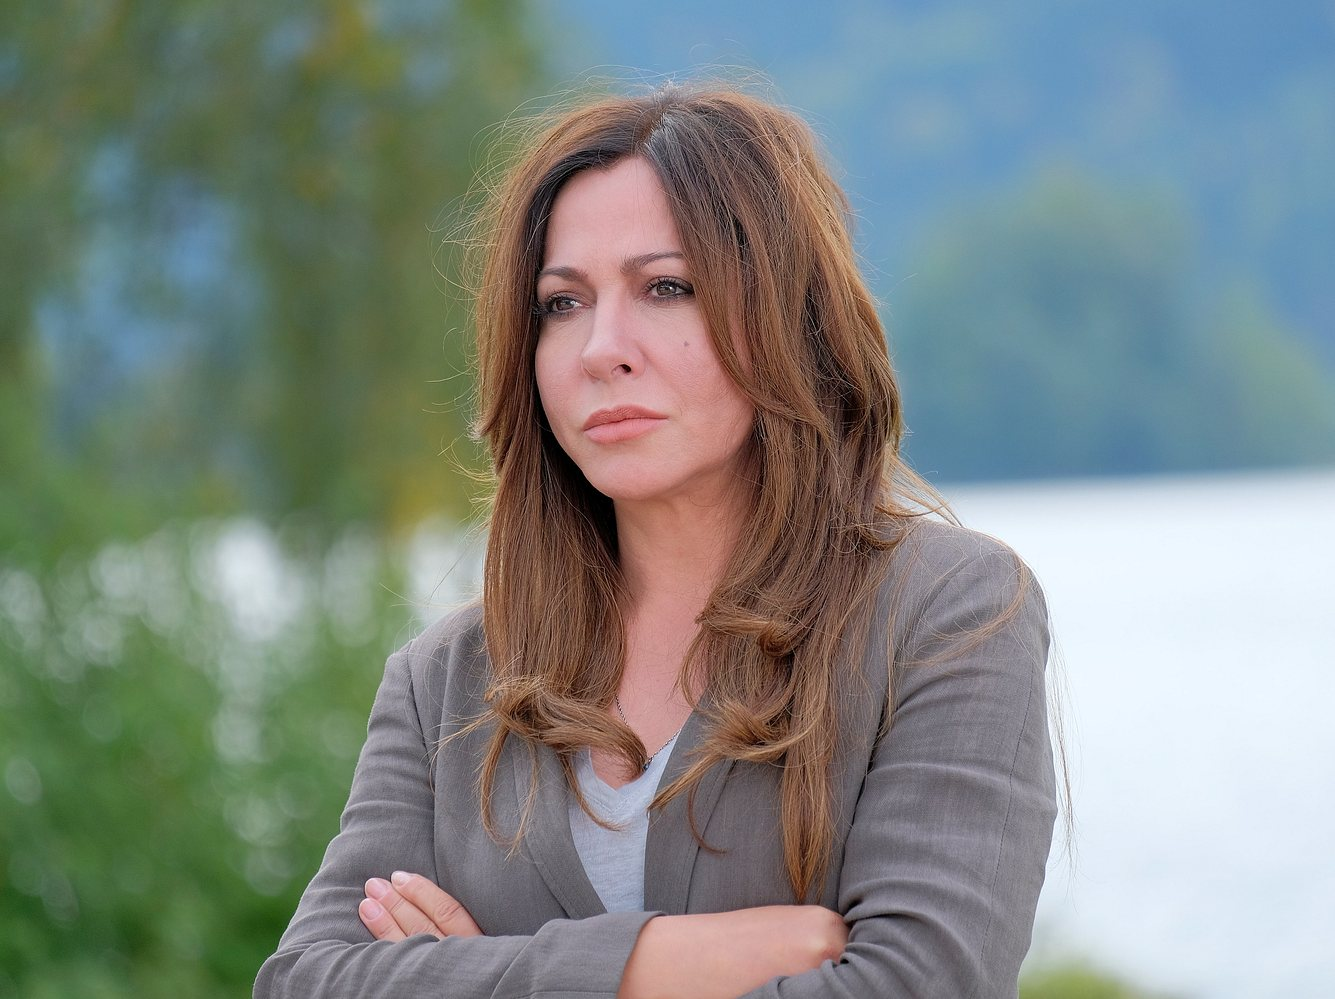 Simone Thomalla als Katja Baumann